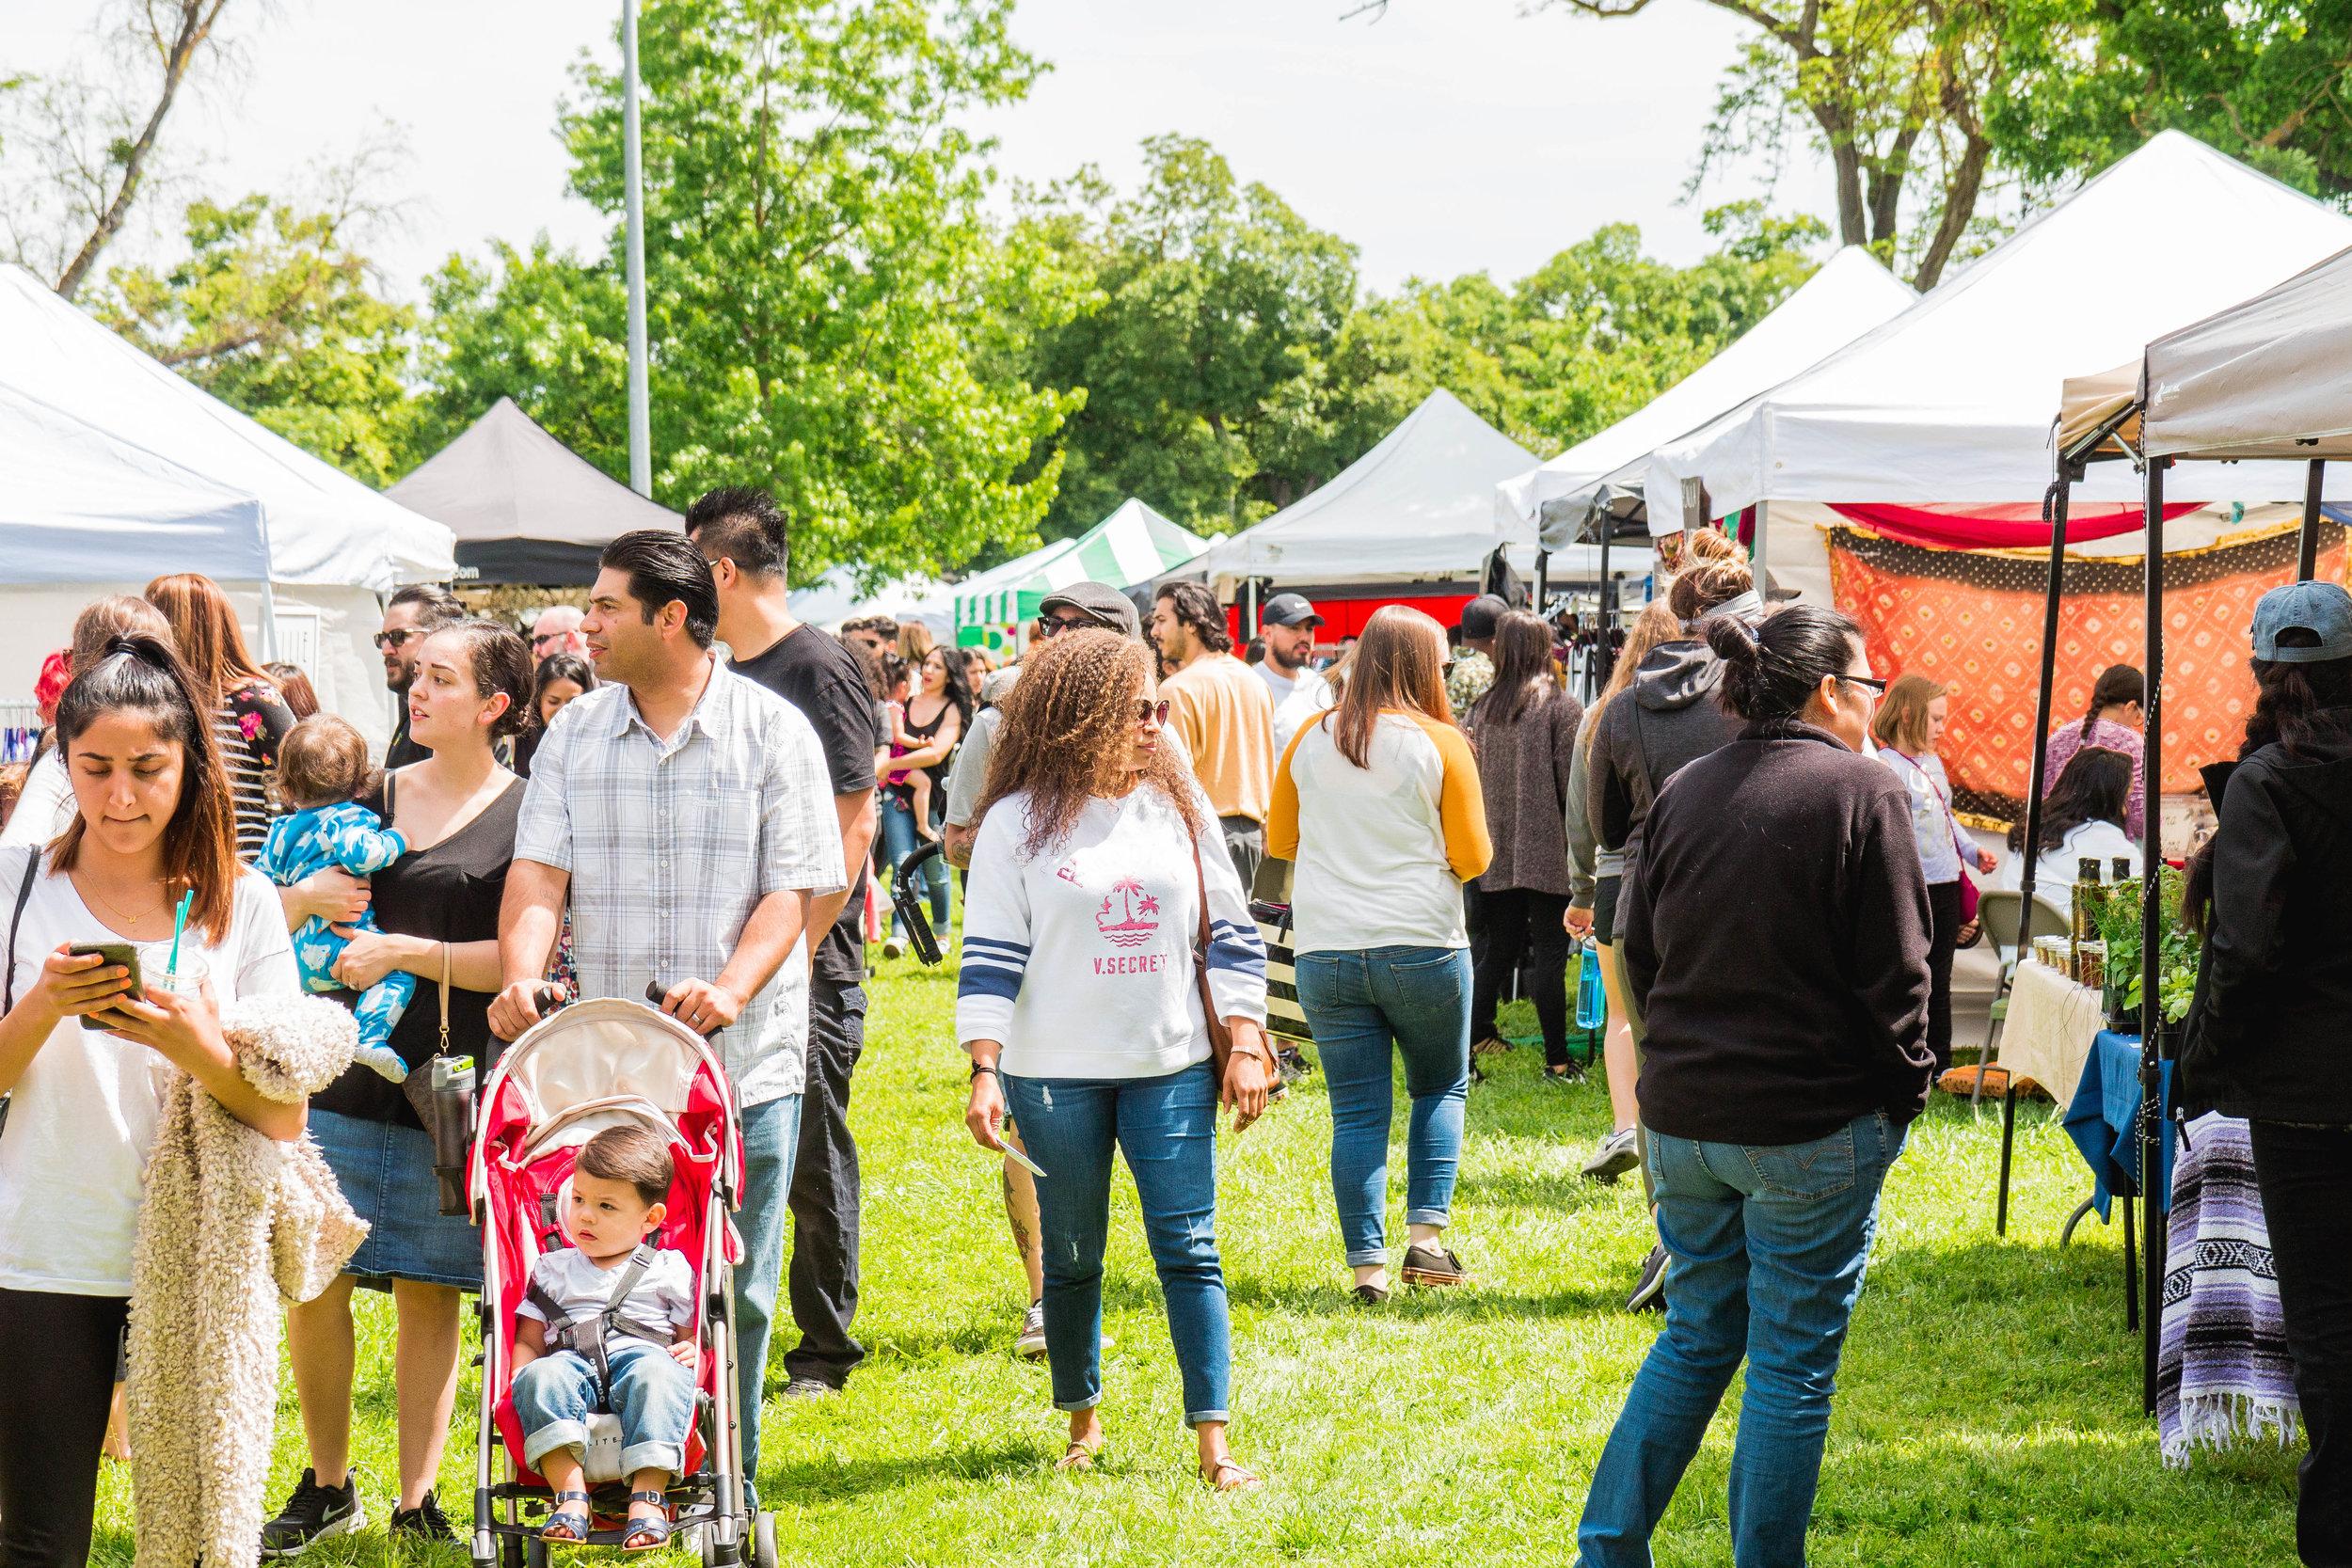 Summer Festival Family Craft Fair Open Air Market